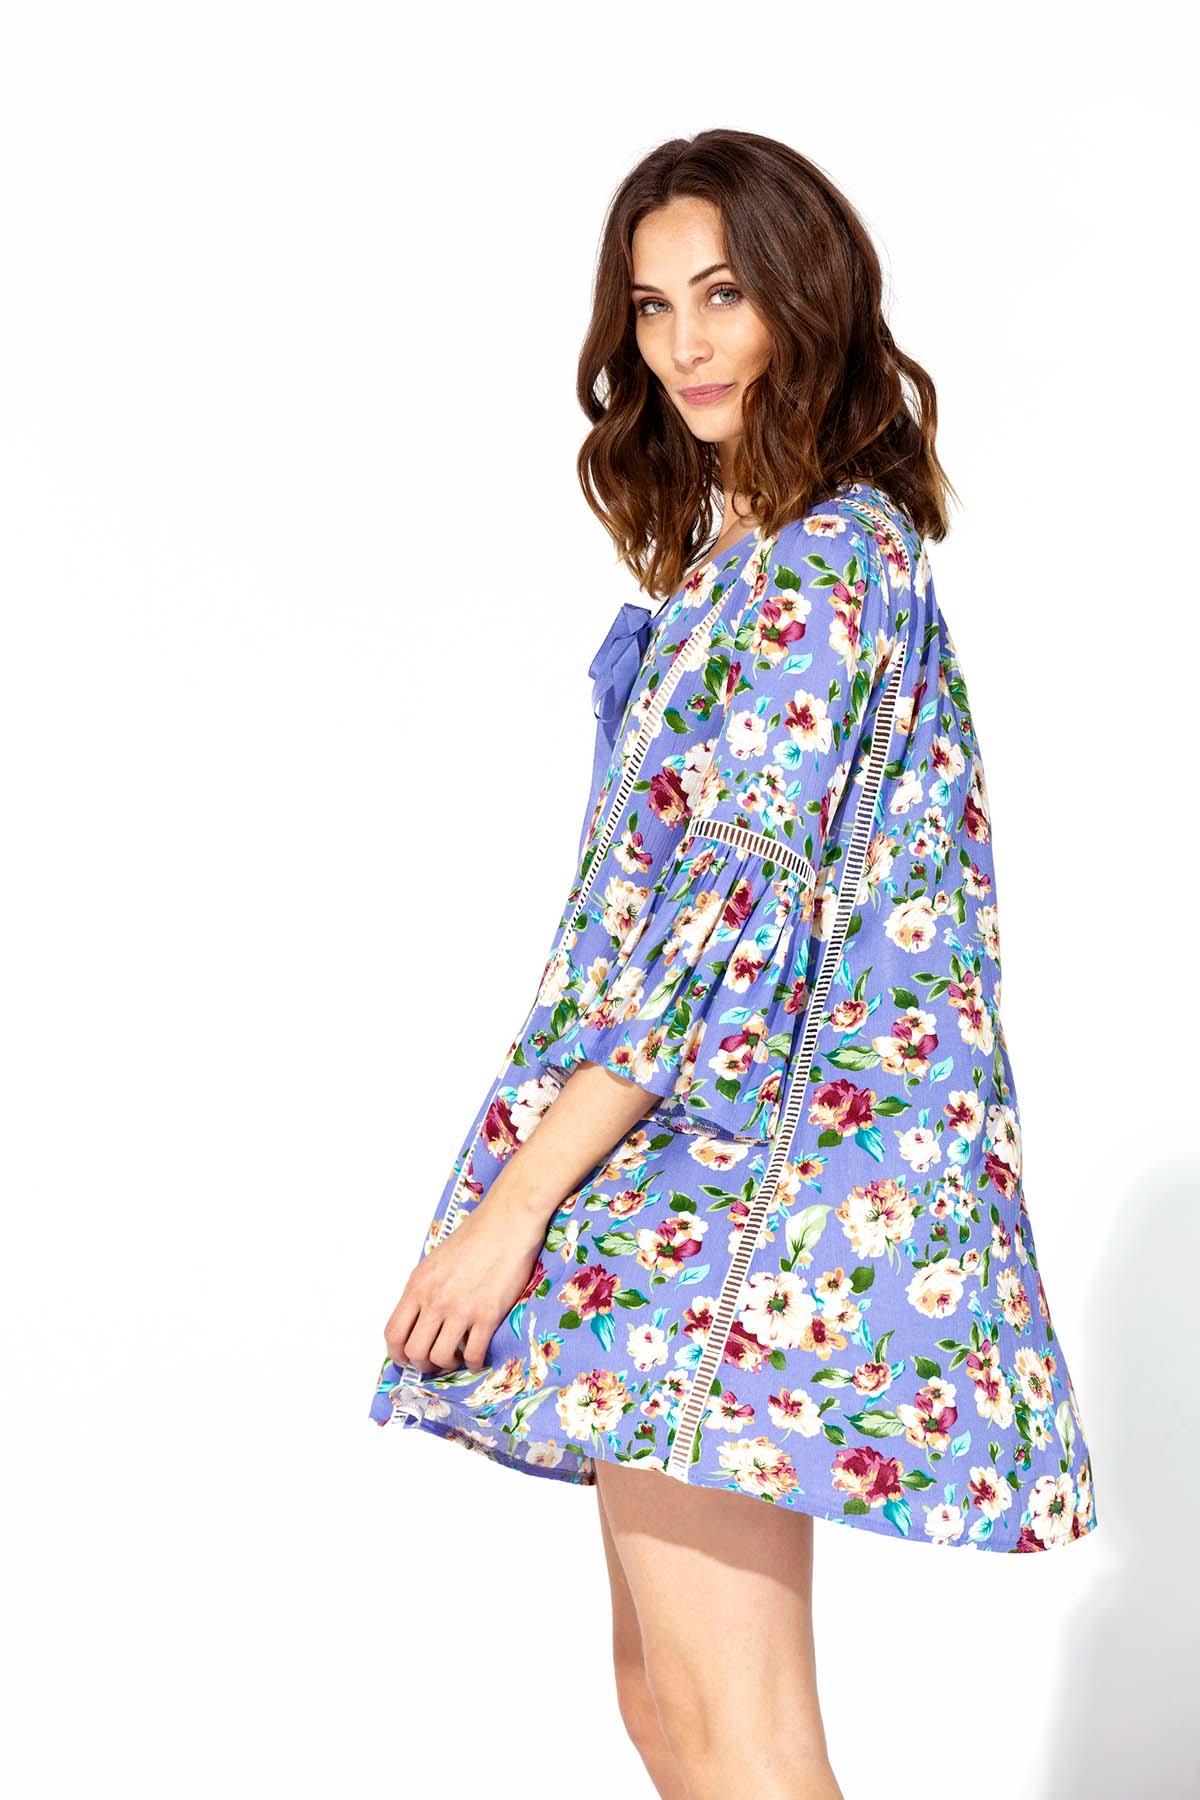 Vestido azul de flores Teria Yabar - Vestido azul de flores